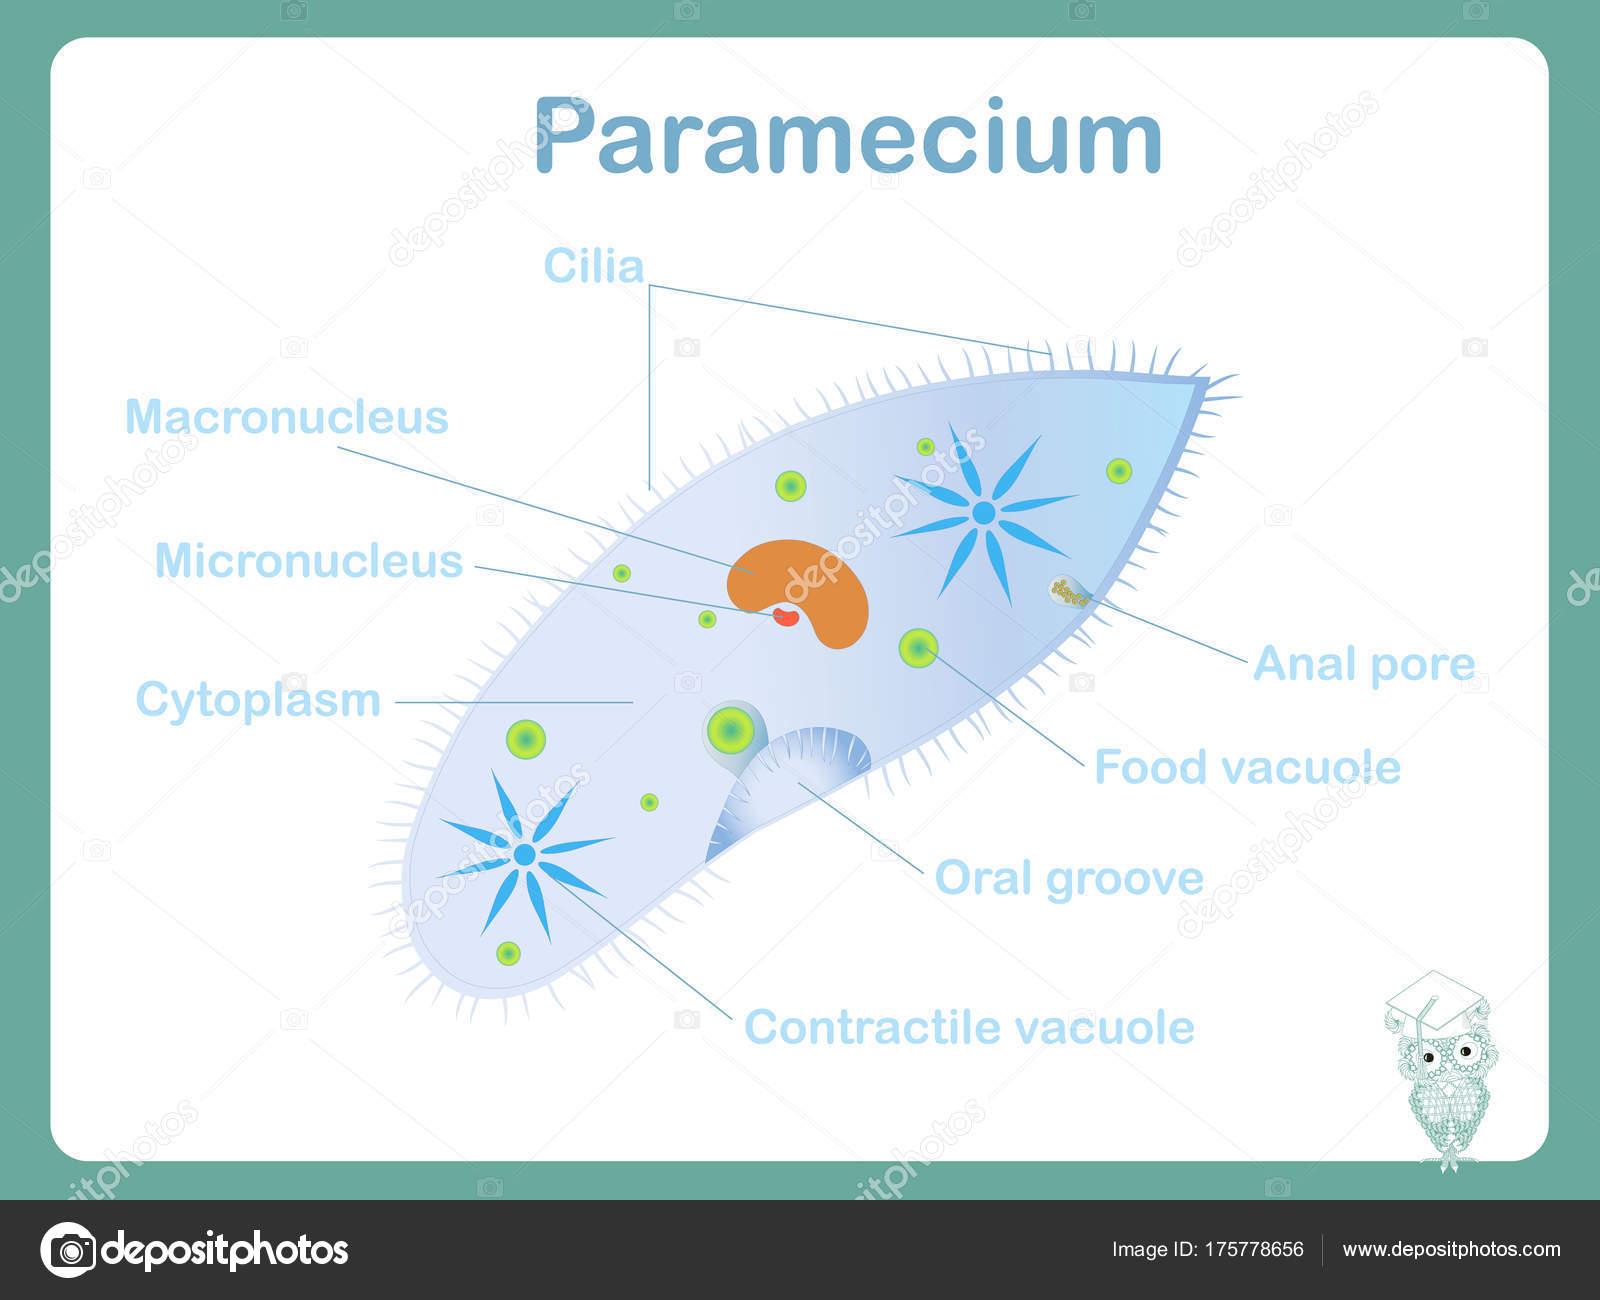 Structure scheme paramecium school biology lessons stock vector structure scheme paramecium school biology lessons stock vector illustration stock vector pooptronica Gallery